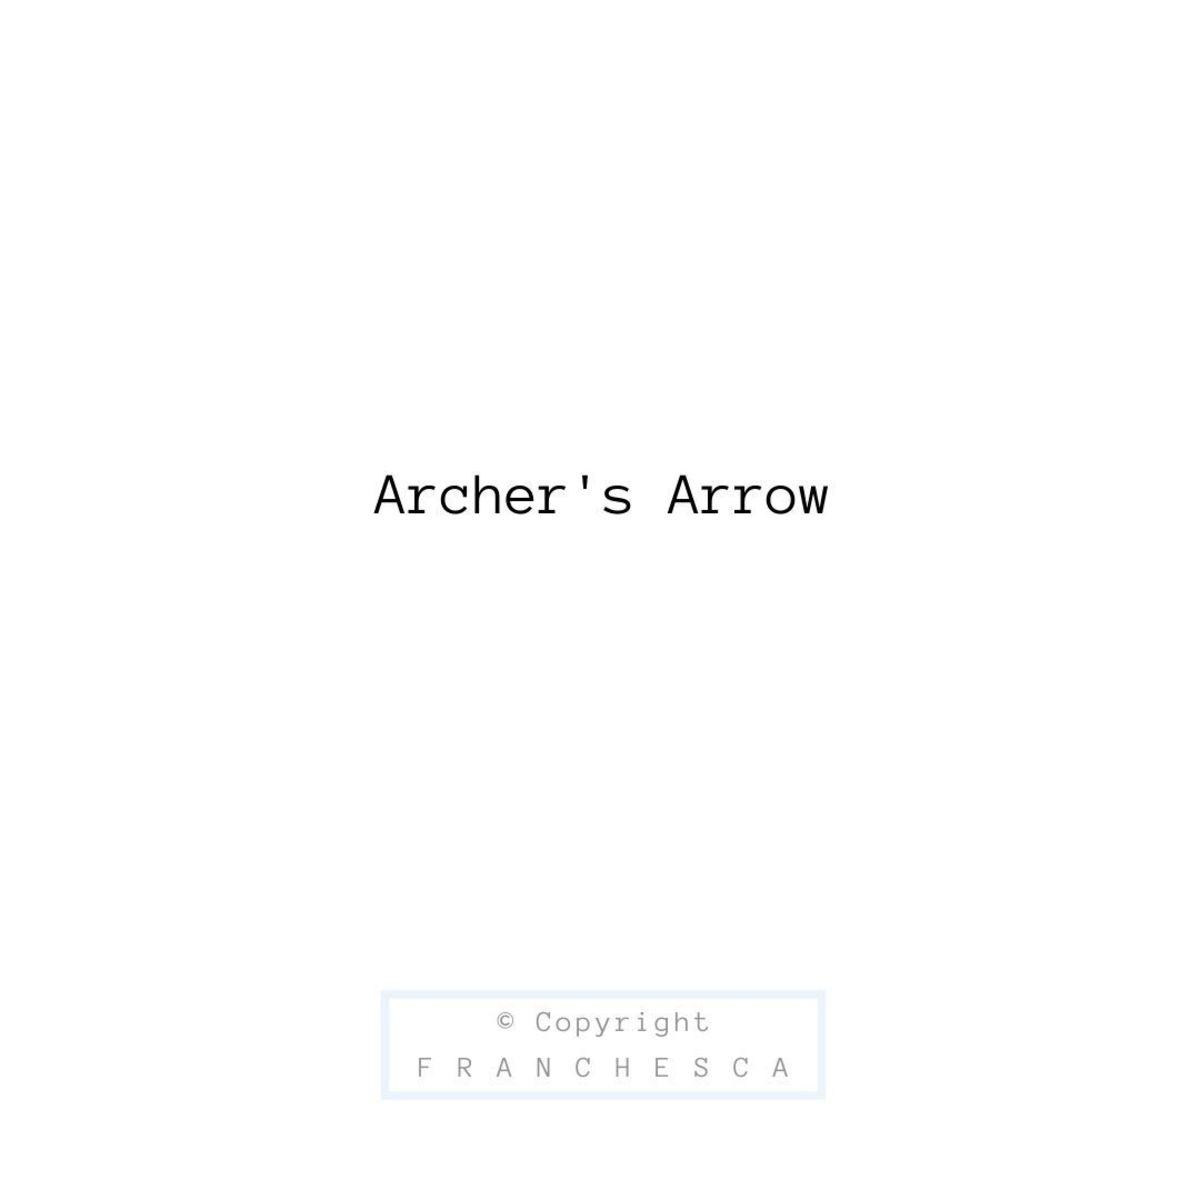 6th-article-archers-arrow